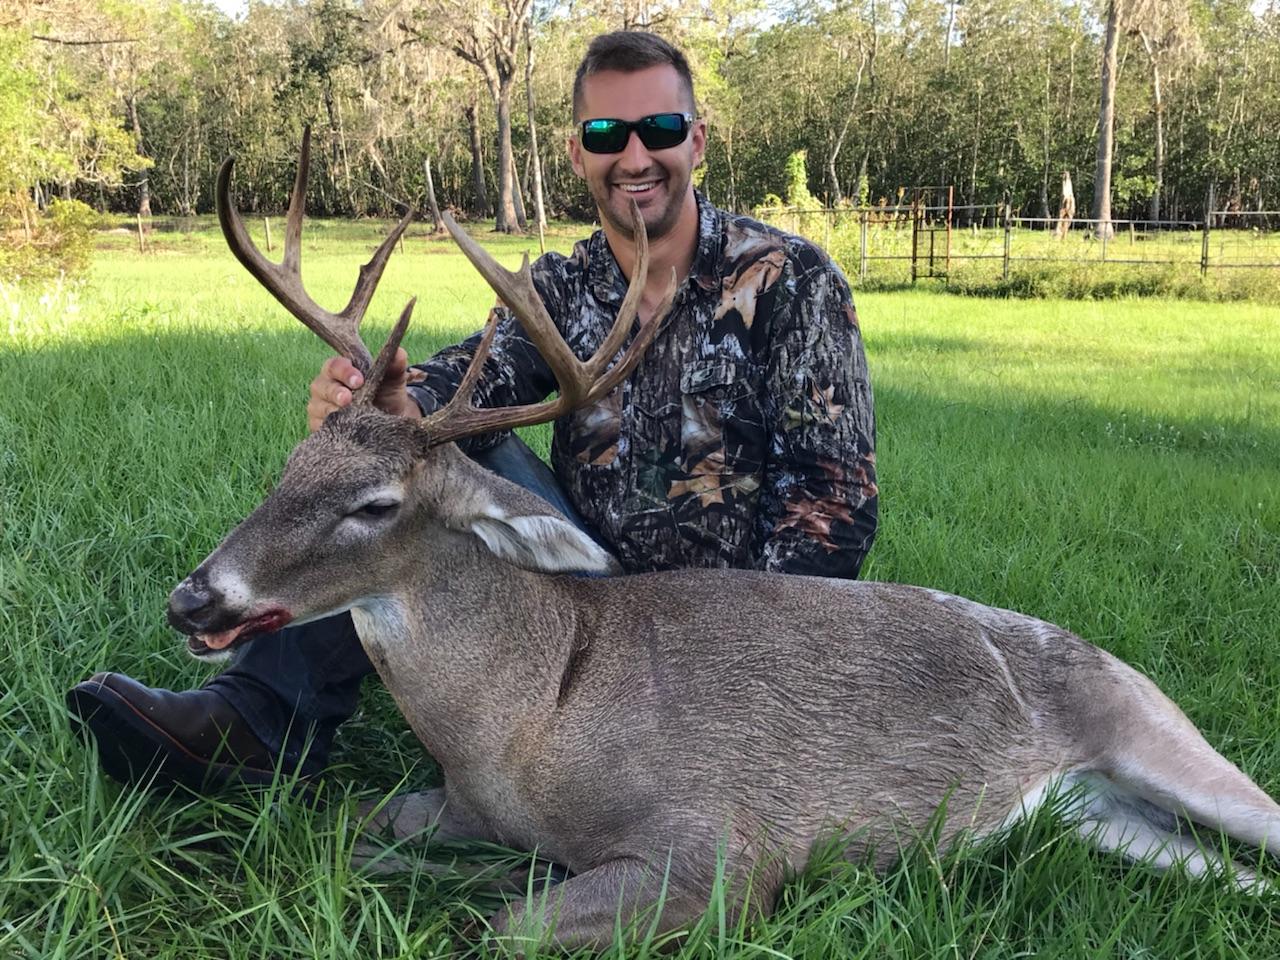 Everglades-Deer-Hunting-Outfitters.jpg